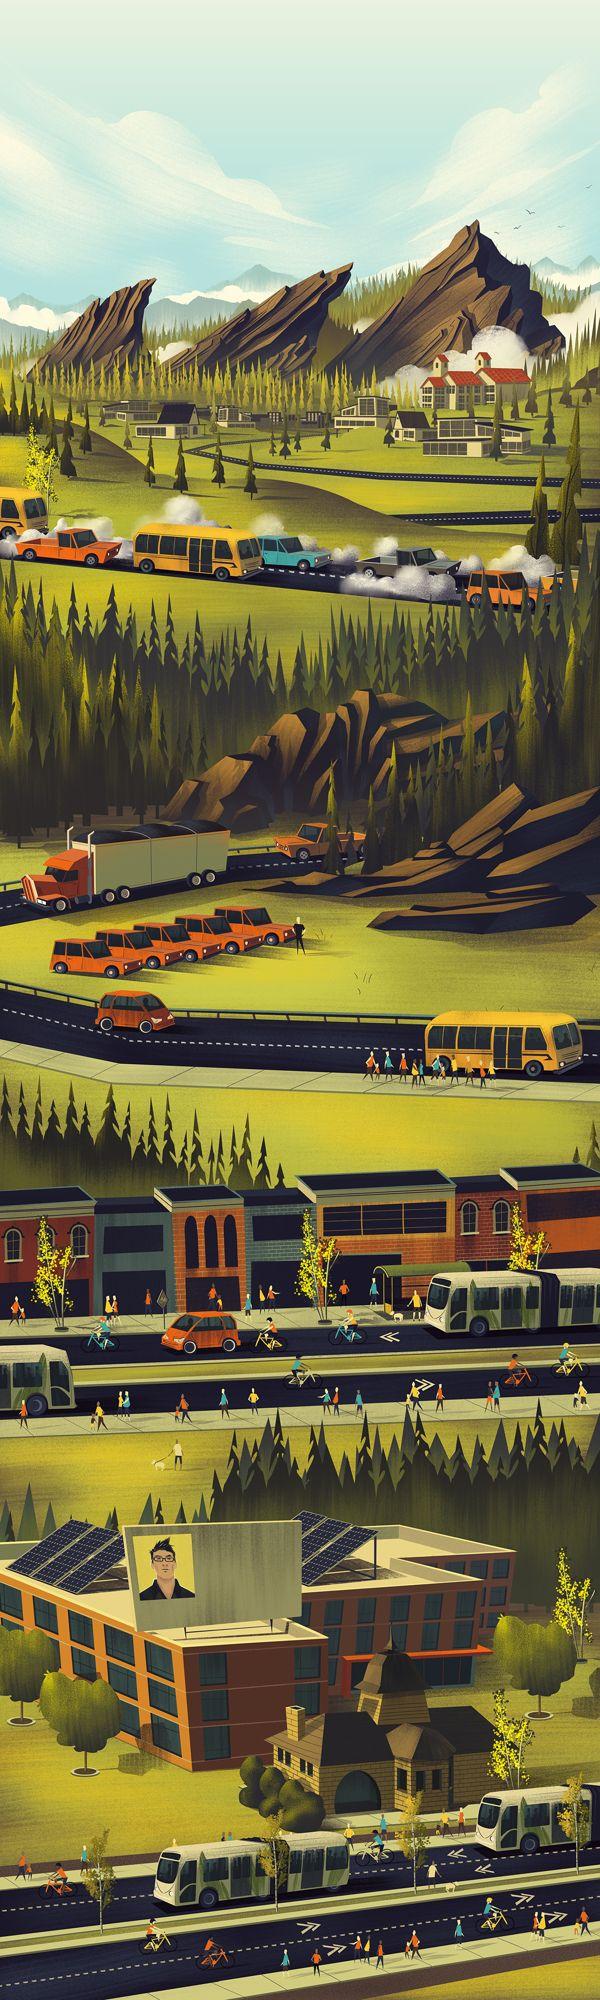 City of Boulder by Brian Miller, via Behance